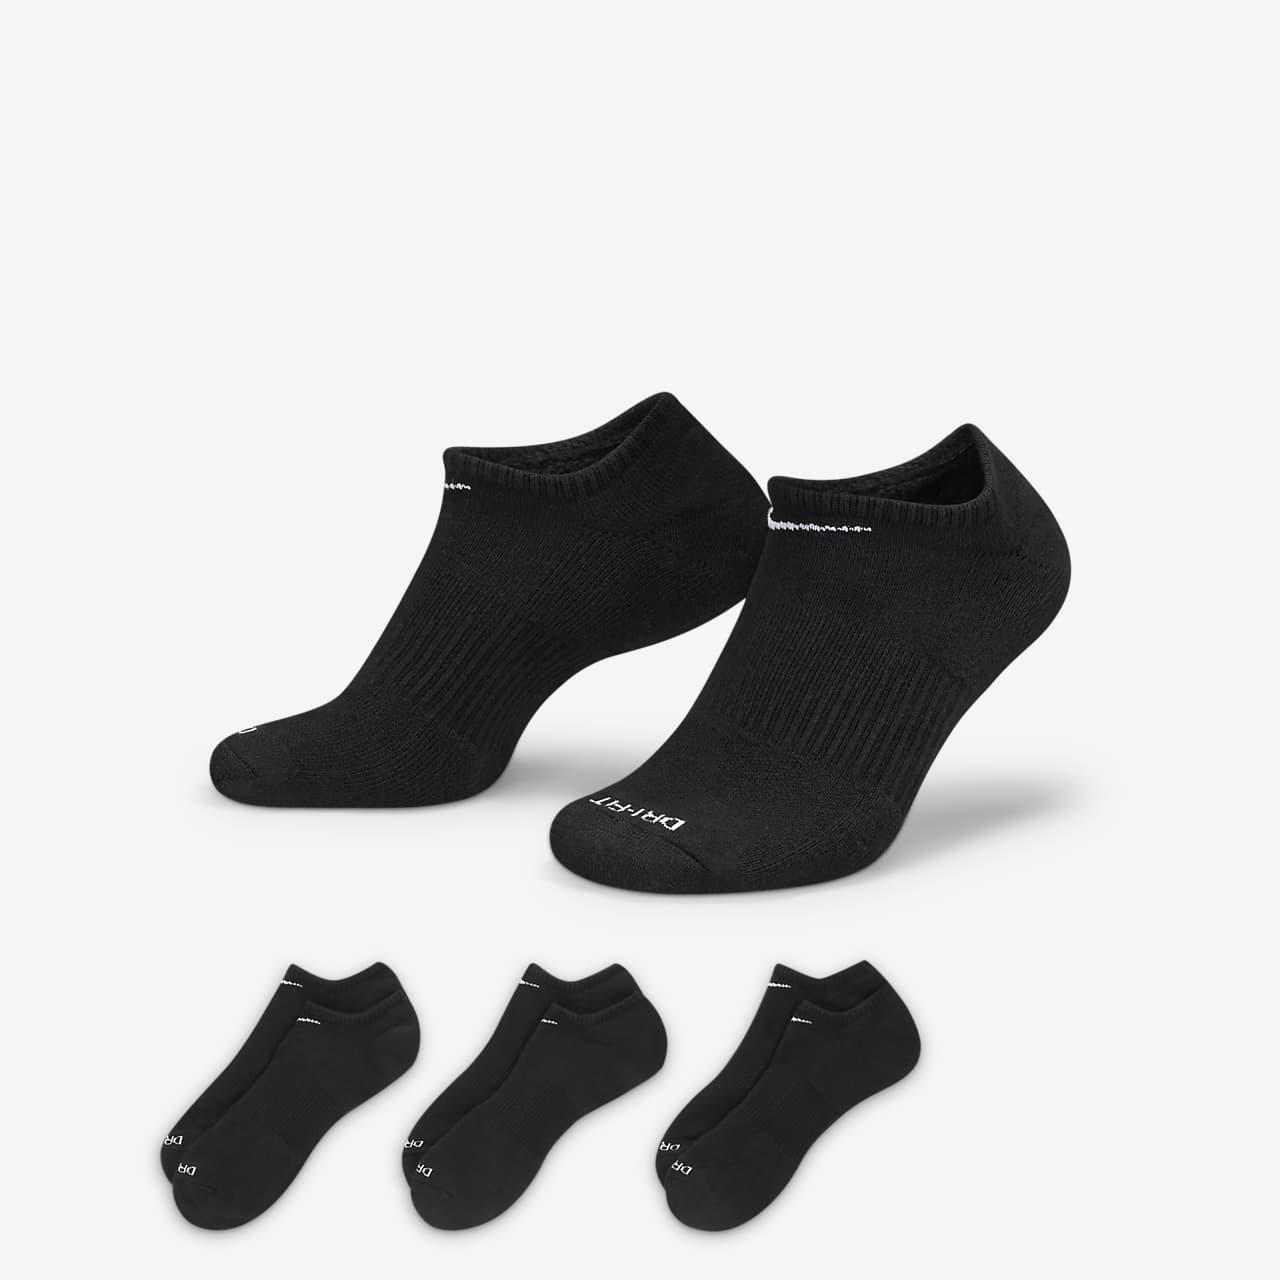 Nike Everyday Plus Cushion Training No-Show Socks (3 Pairs)